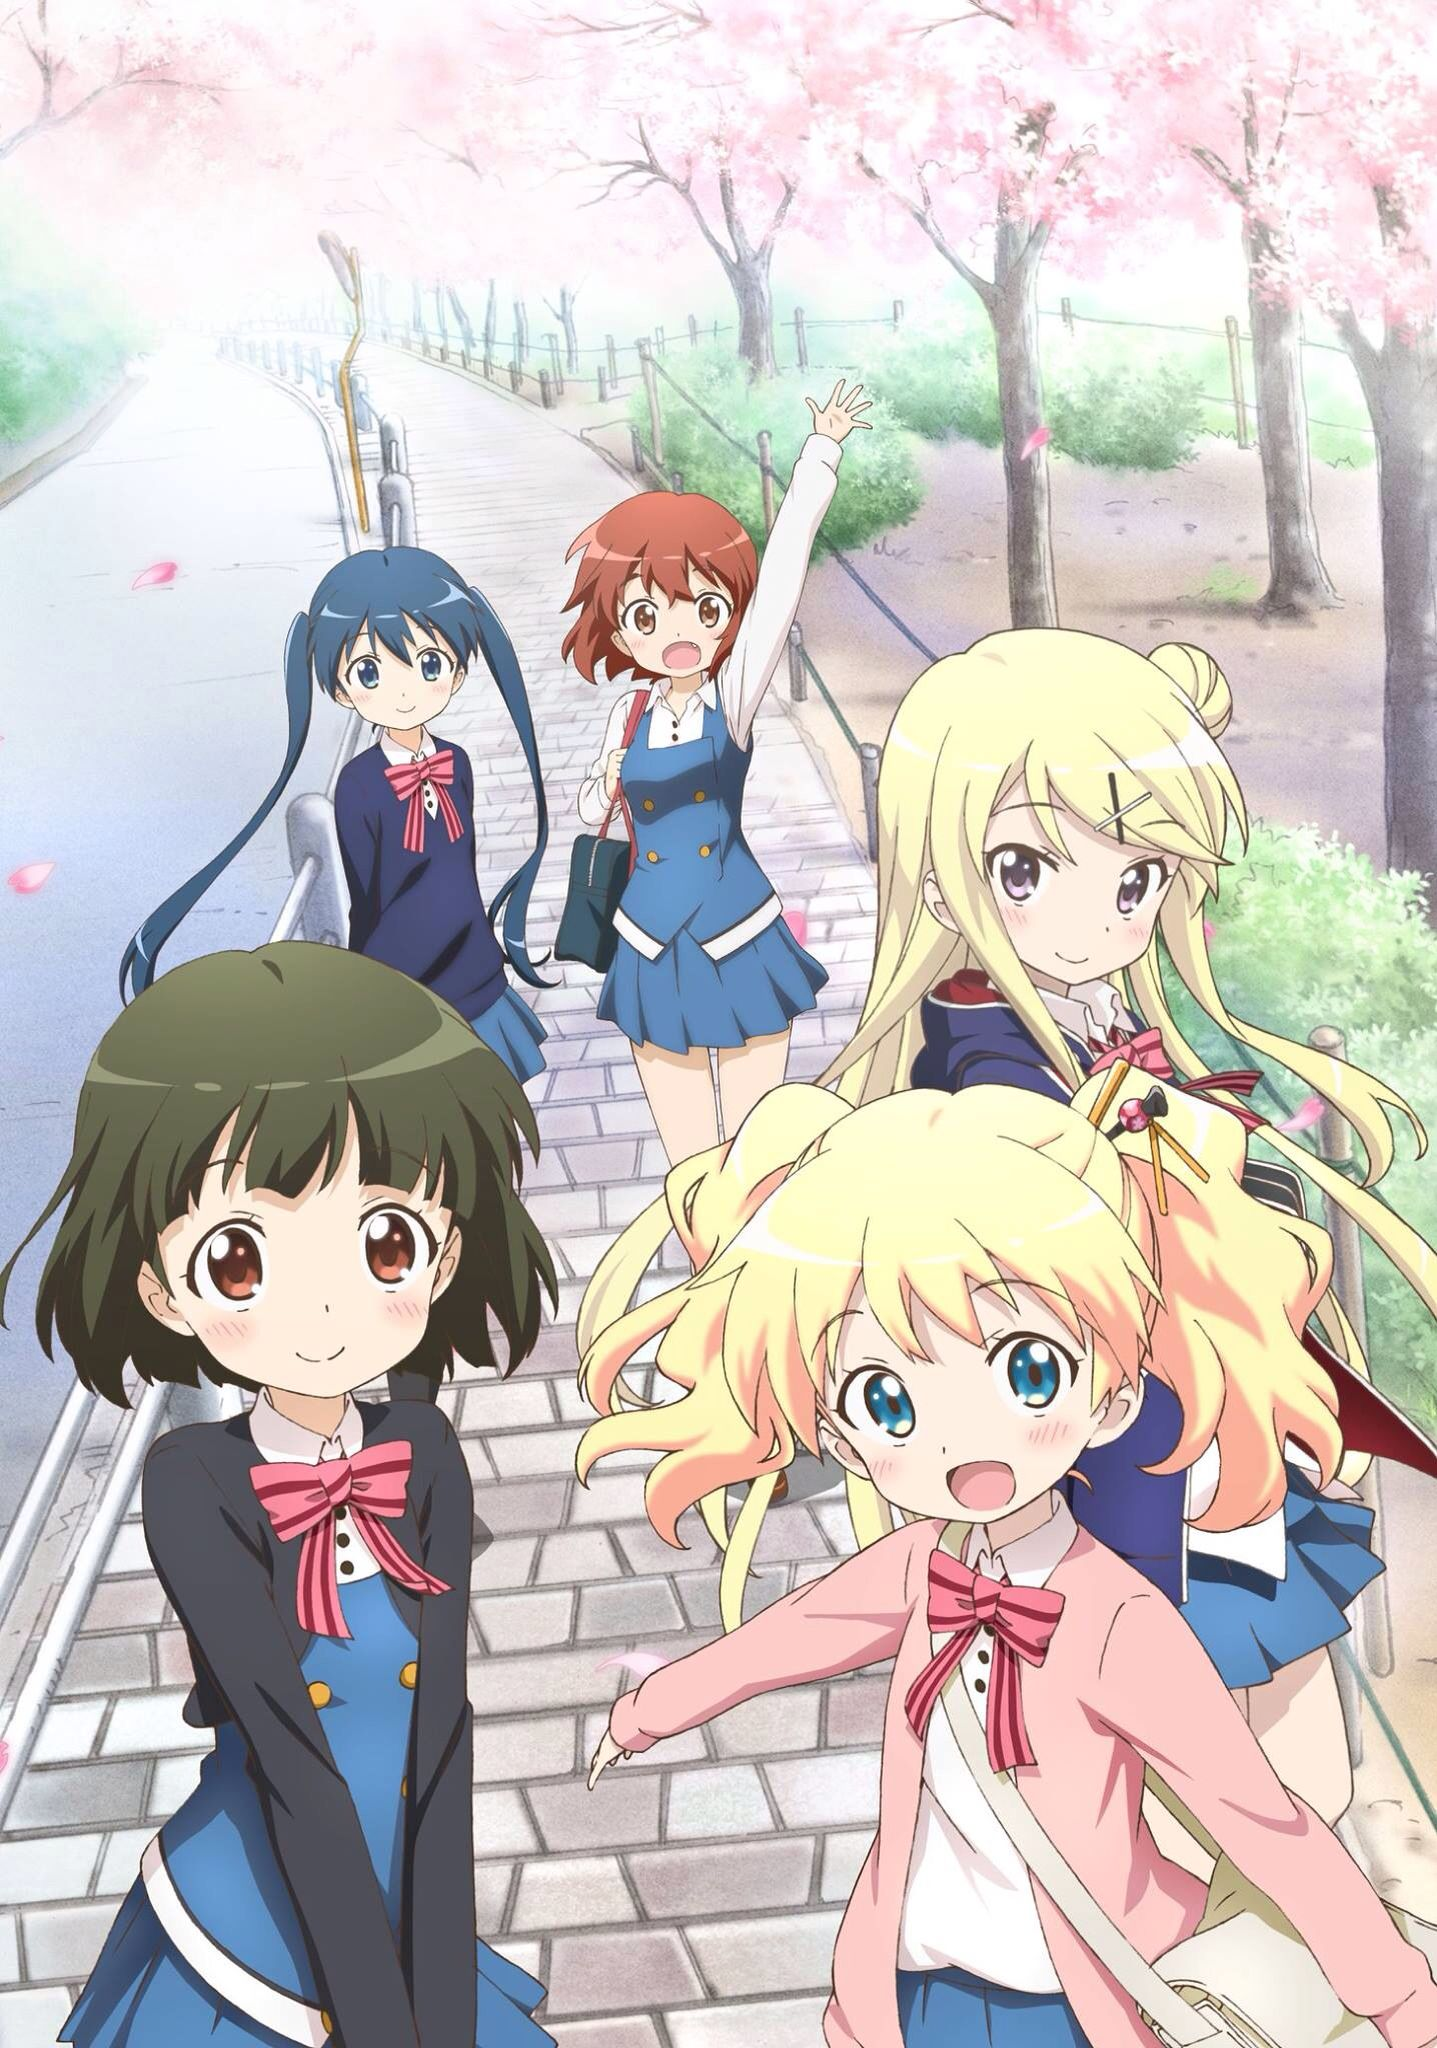 School Girls Anime Anime Reviews Mosaic